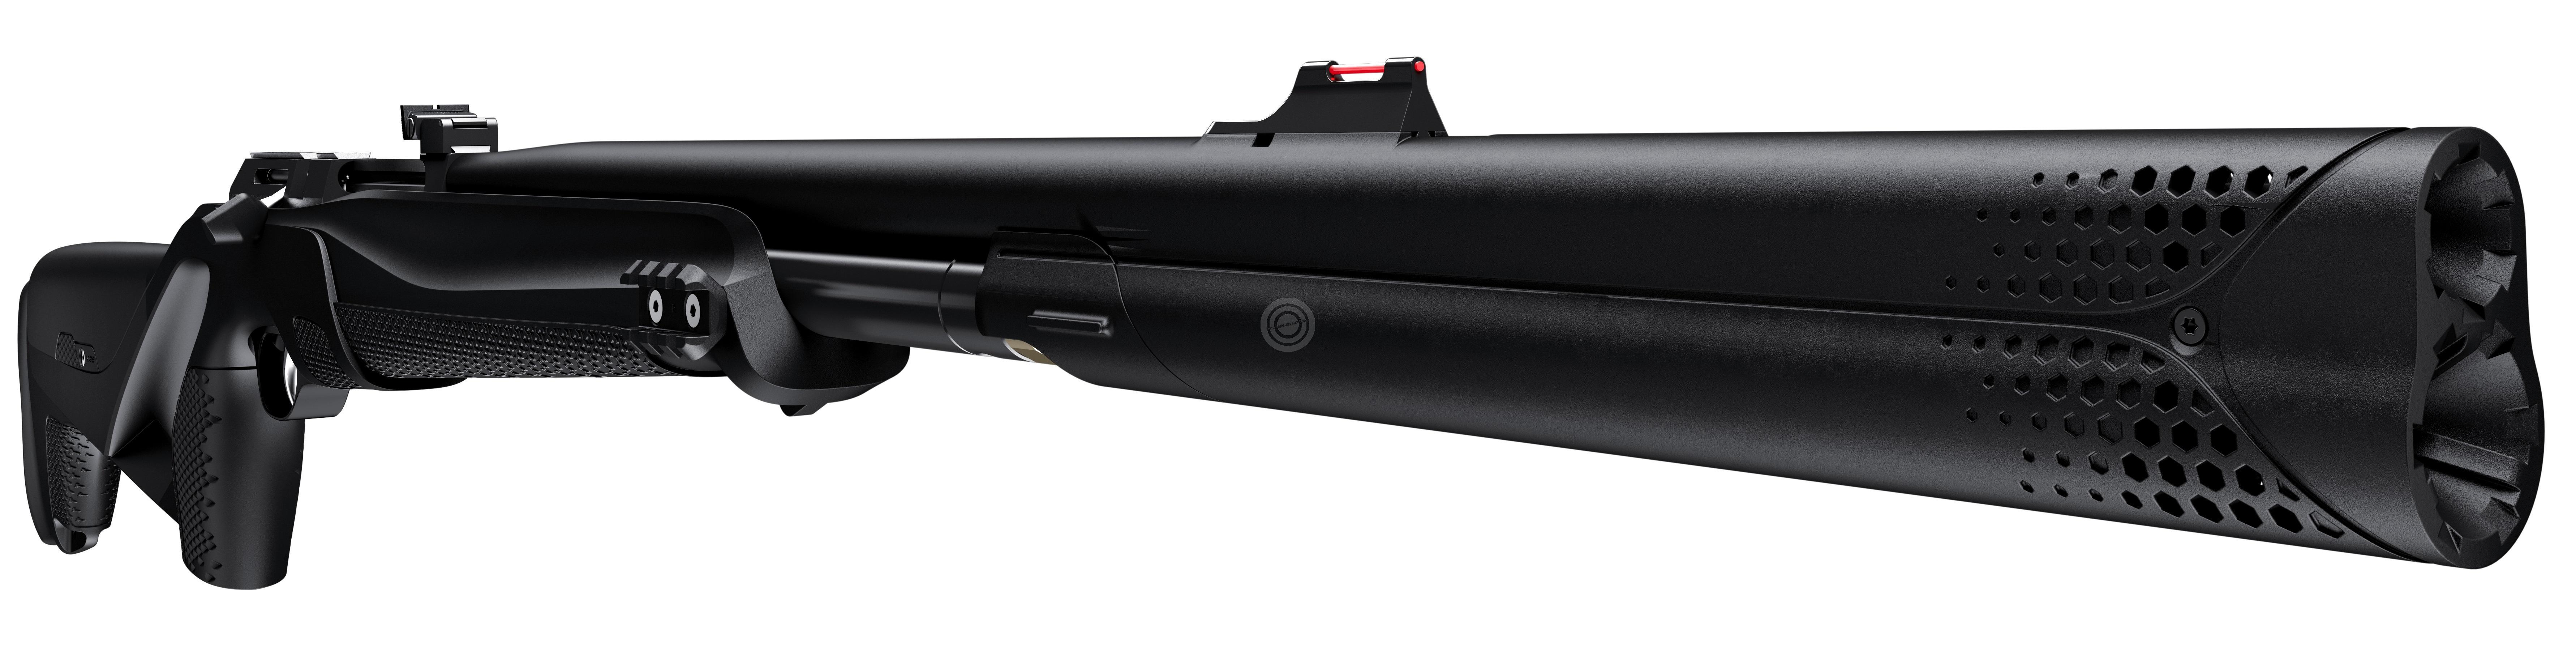 PCP Stoeger XM1 à 300 euros XM1_Emotional_S4_Suppressor_01